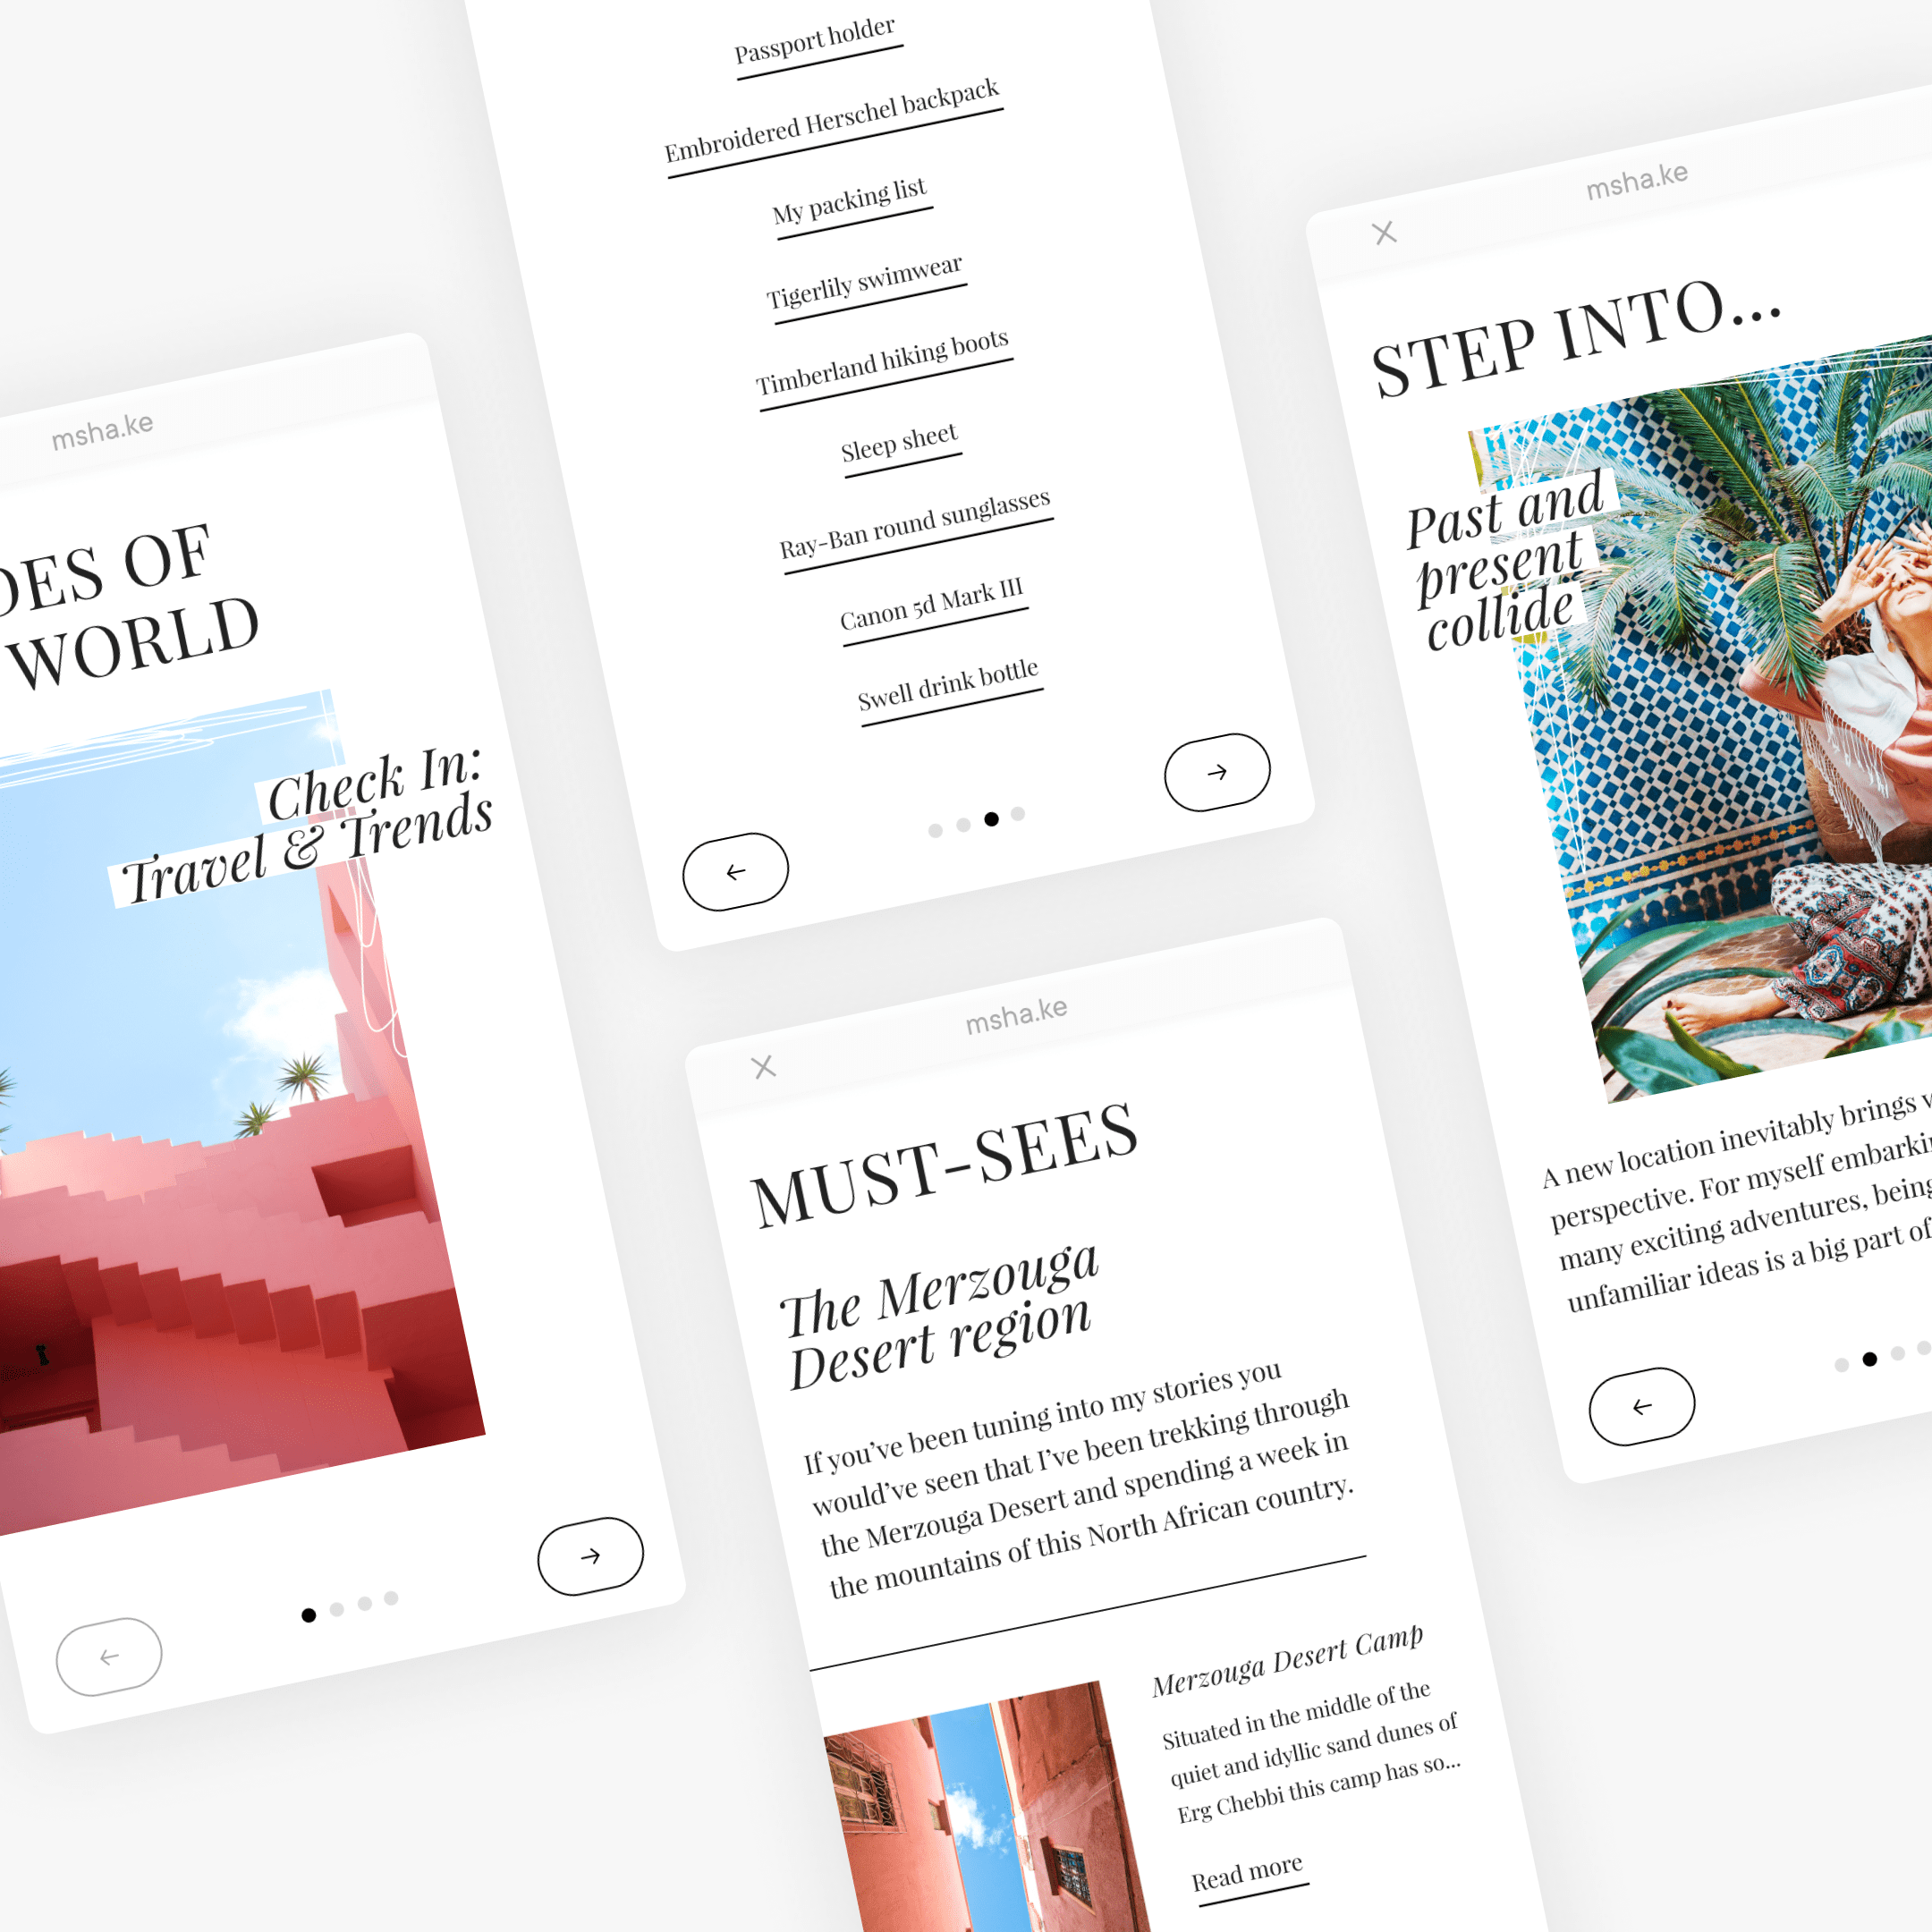 UI DESIGN | LUNAR STUDIOS